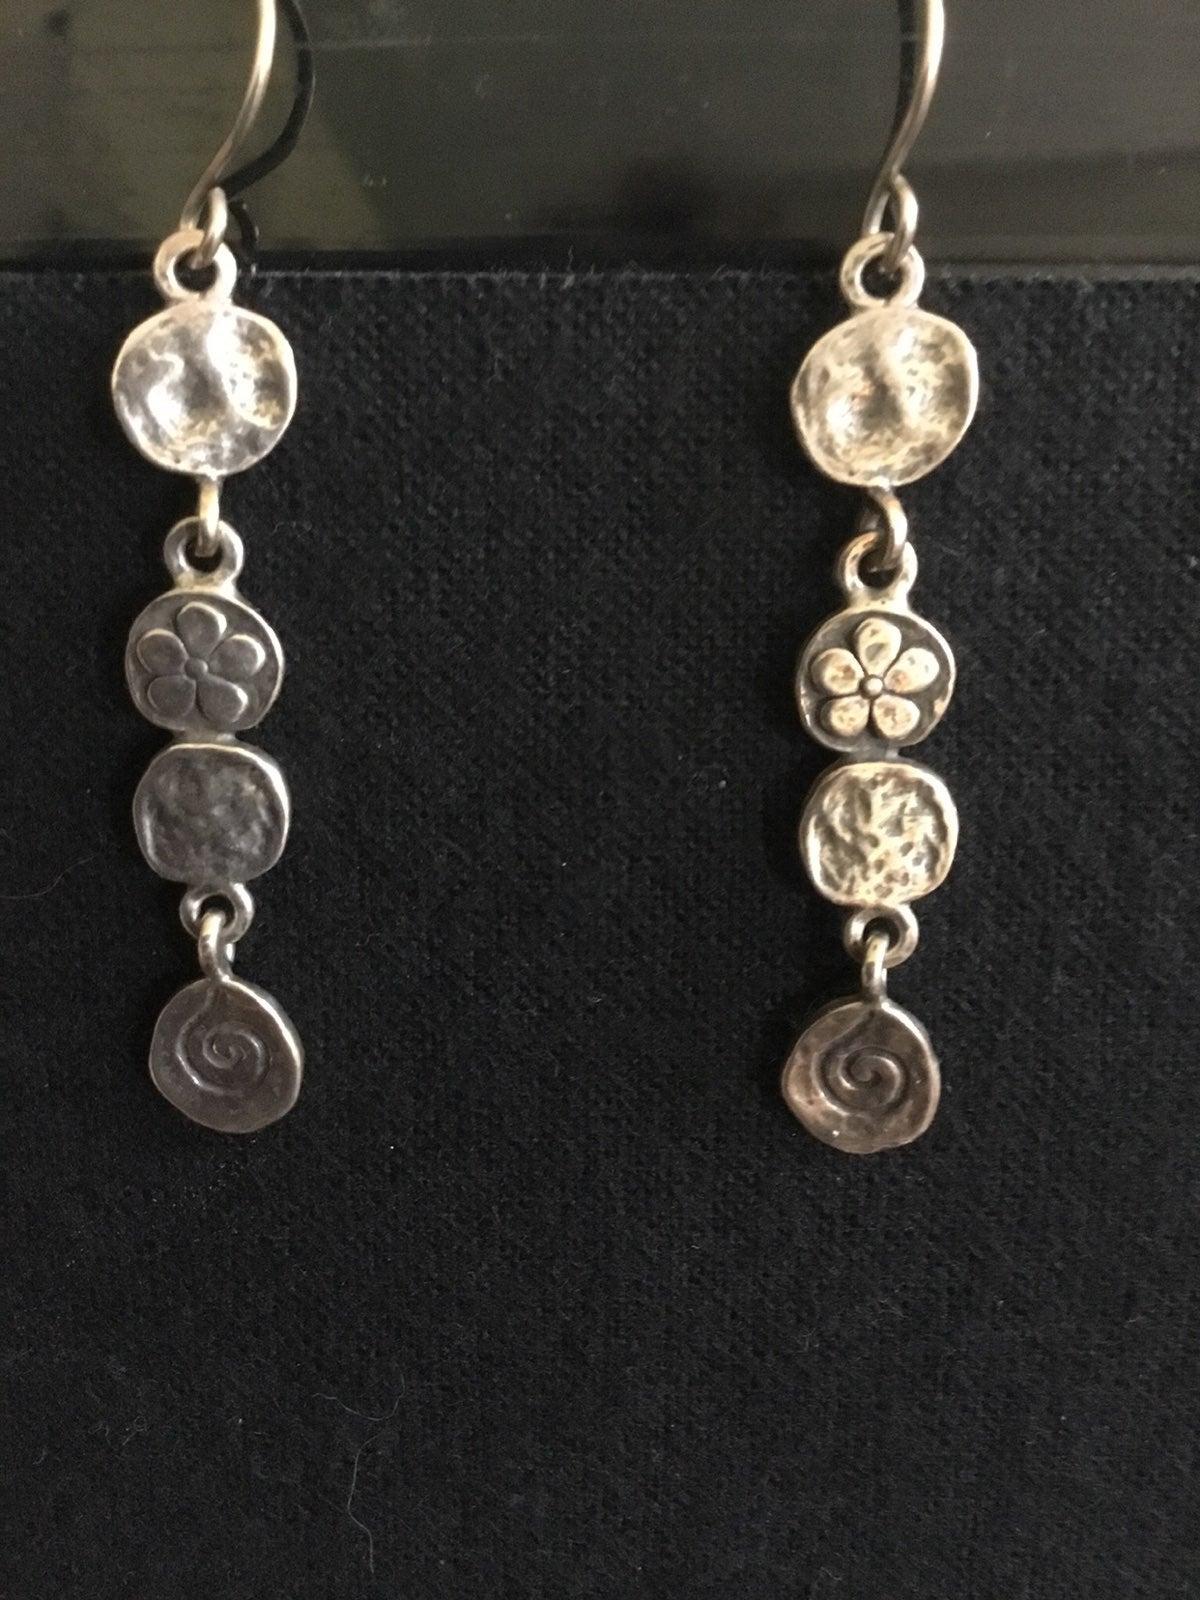 1 12 Silpada Sterling Silver Hammered Flower Dangle Earrings FREE SHIPPING Oxidized Floral Garden Wedding Boho Modern Art W1155